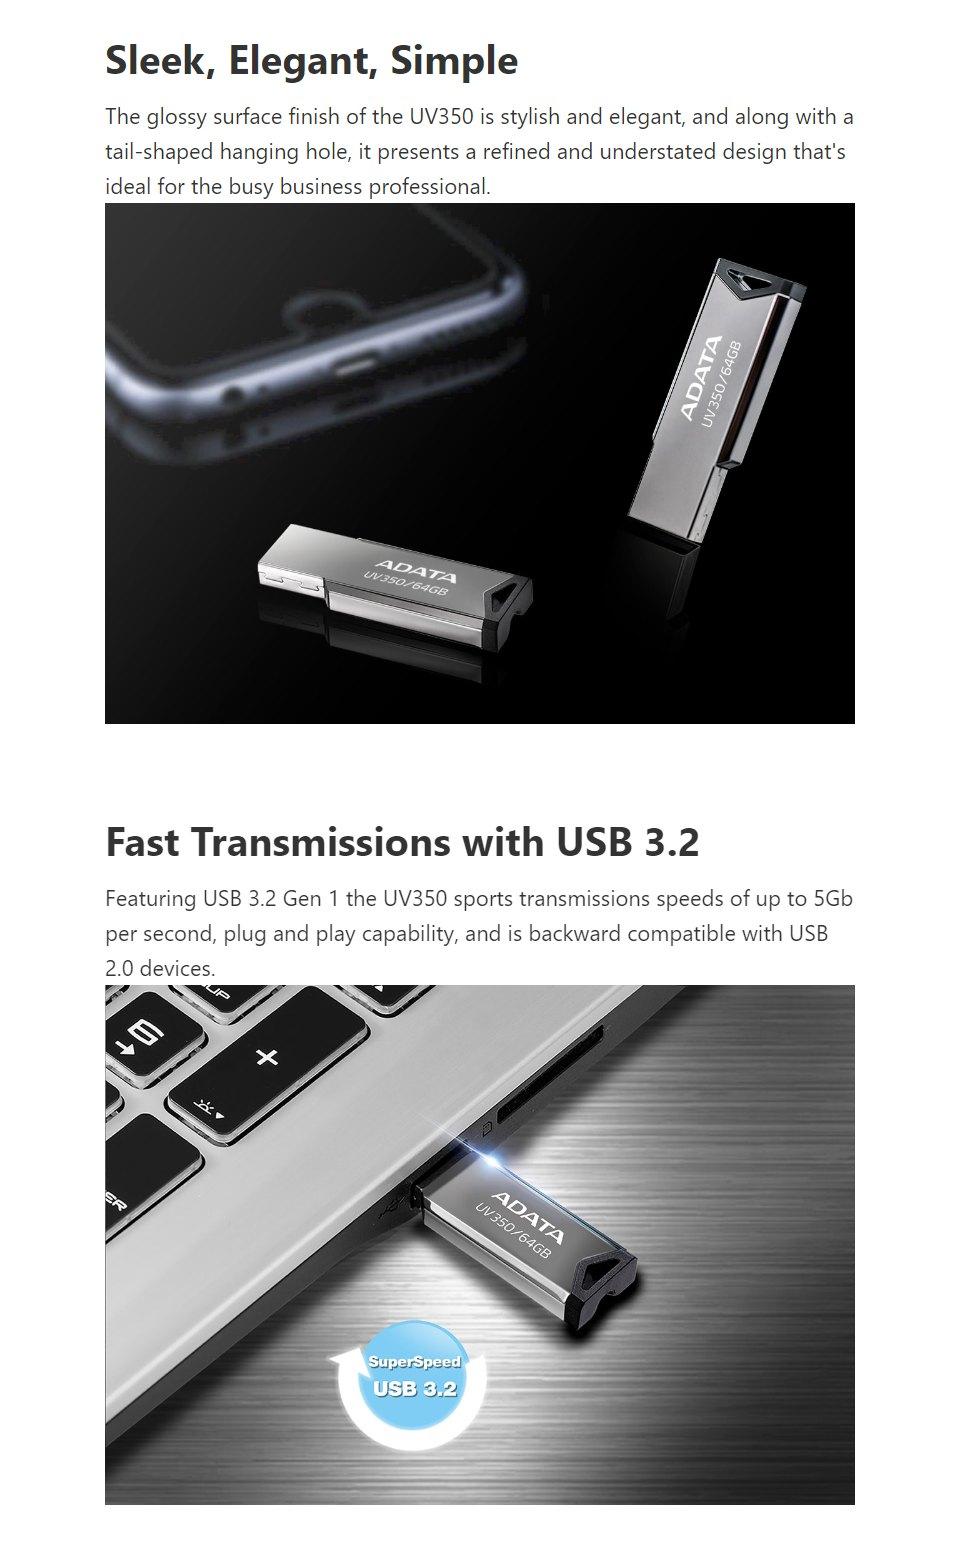 ADATA UV350 USB 3.2 Flash Drive 64GB features